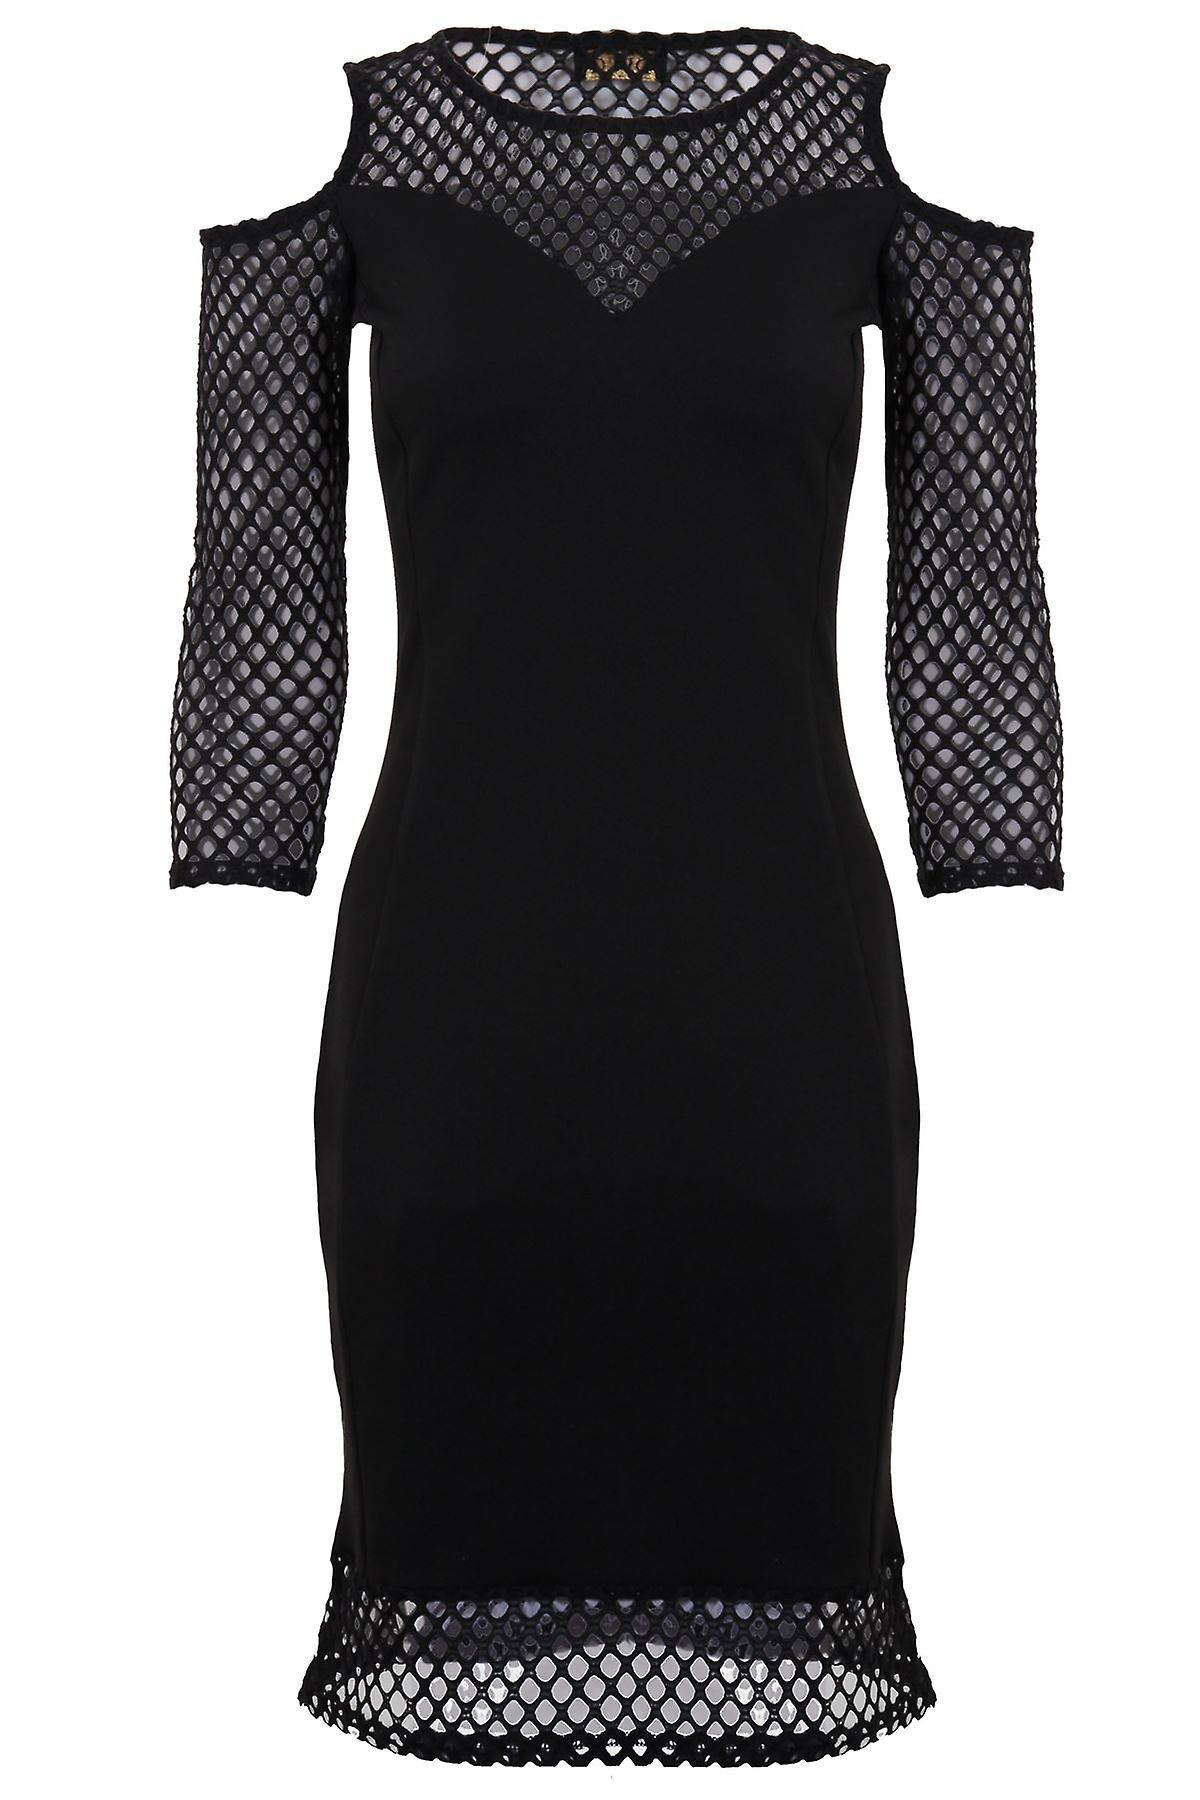 7a3ef7ed91e6 Ladies Long Sleeve Mesh Fishnet V Front Cut Out Cold Shoulder Bodycon Dress